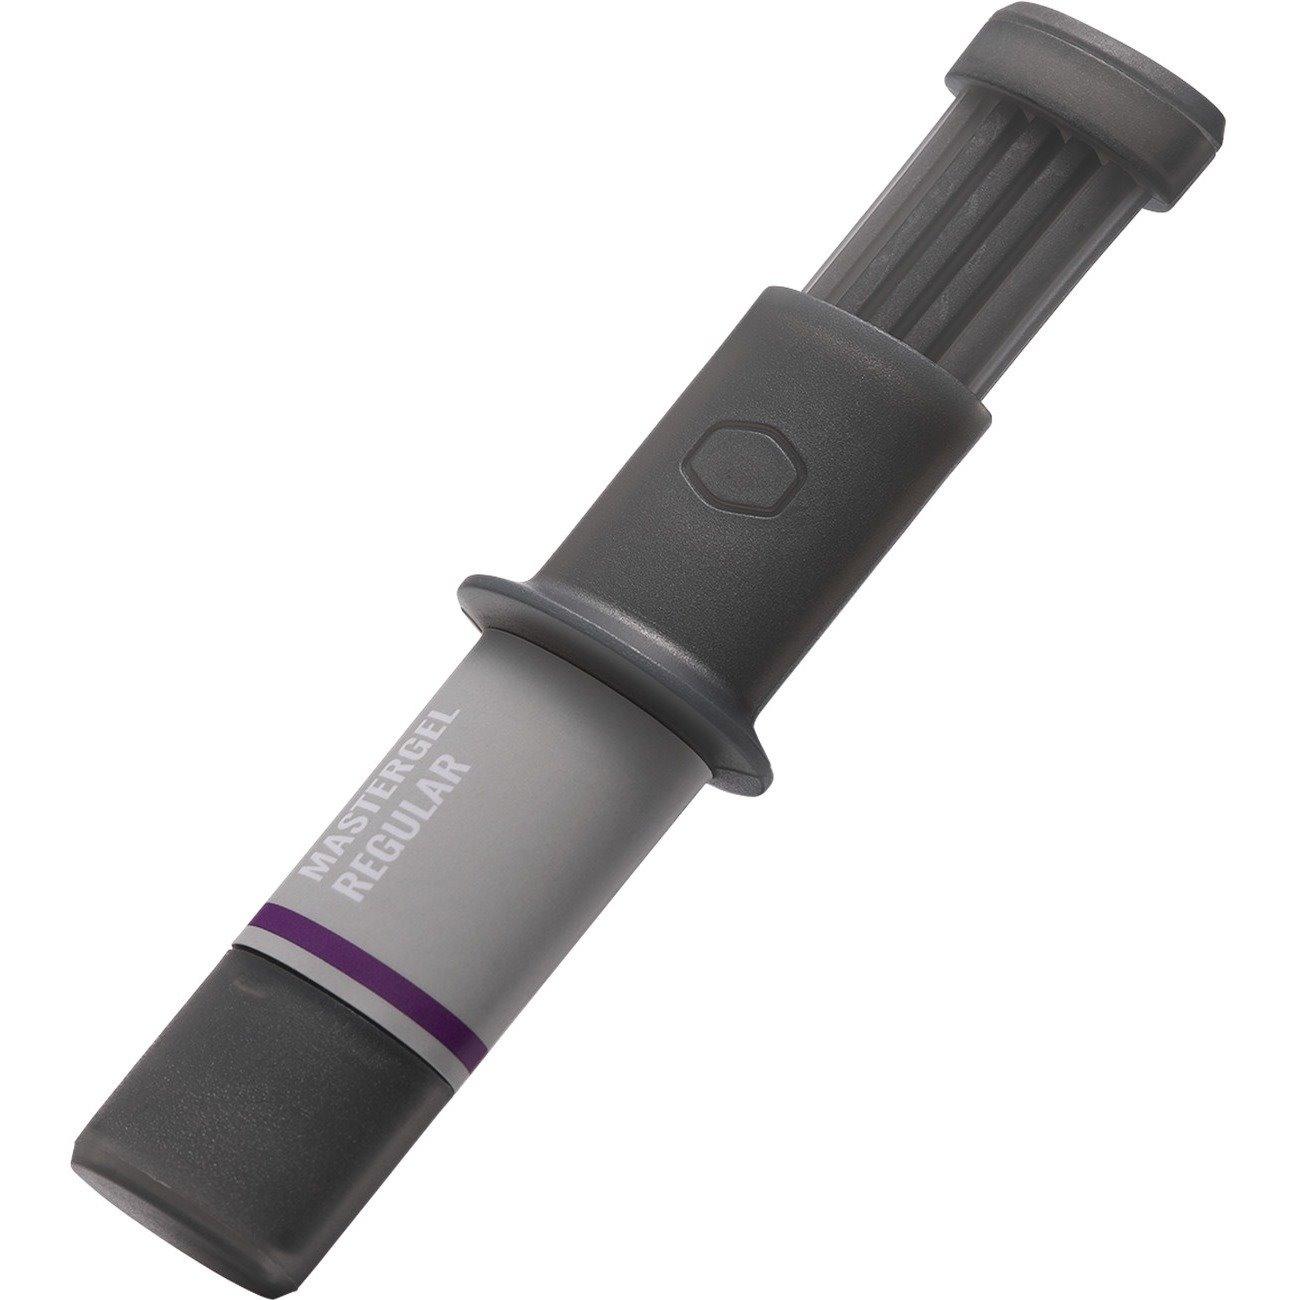 Cooler Master MasterGel Regular 1.50 mL Thermal Grease - Syringe - Grey